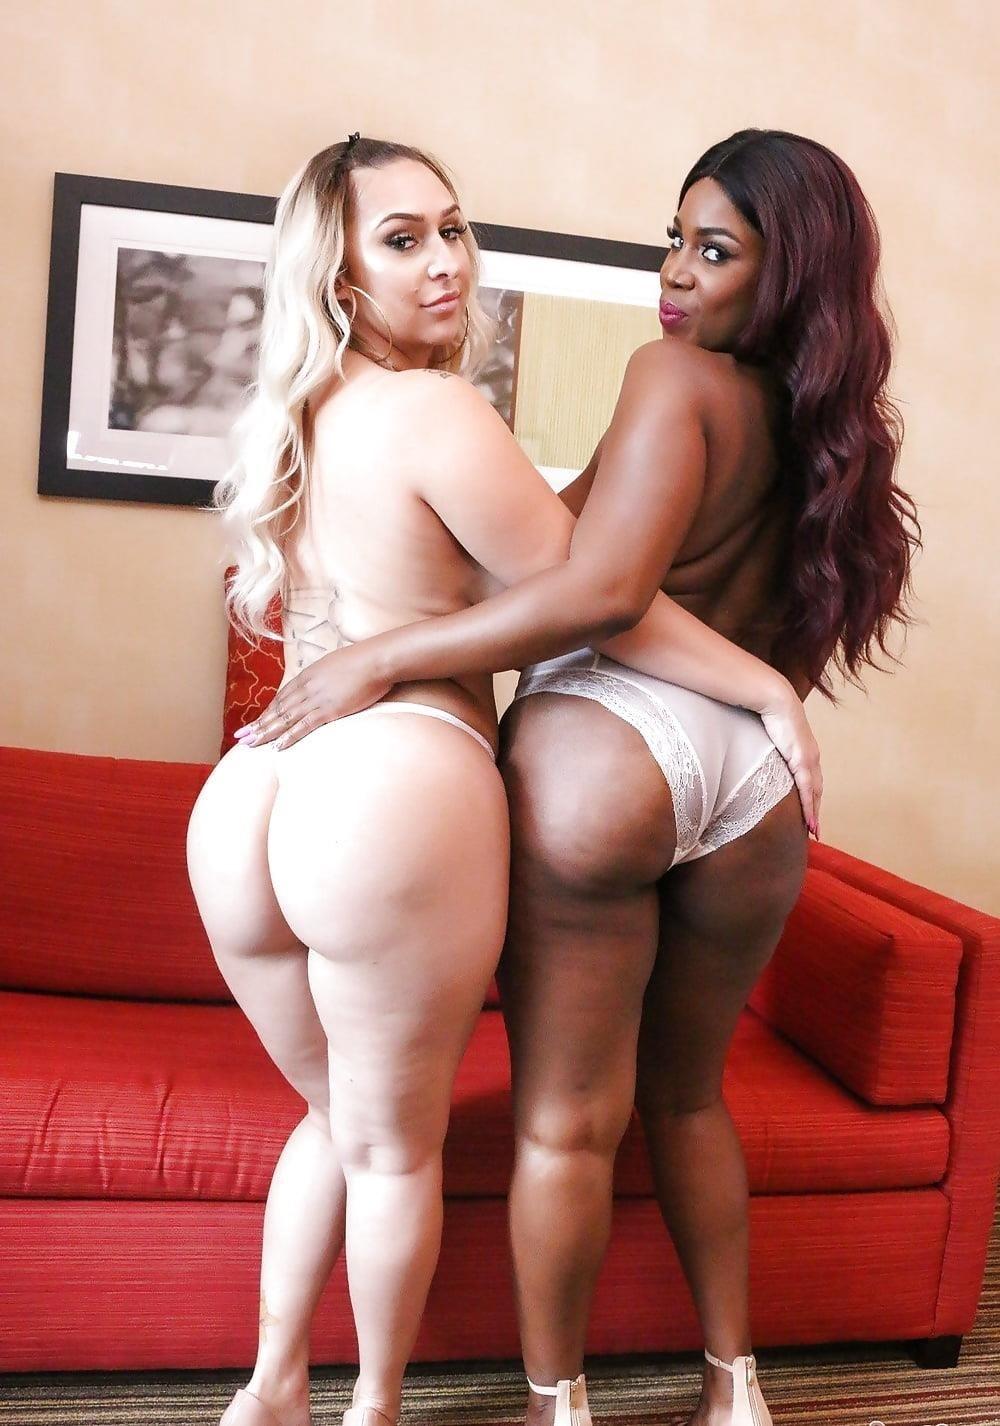 Curvy lesbian pics-9229